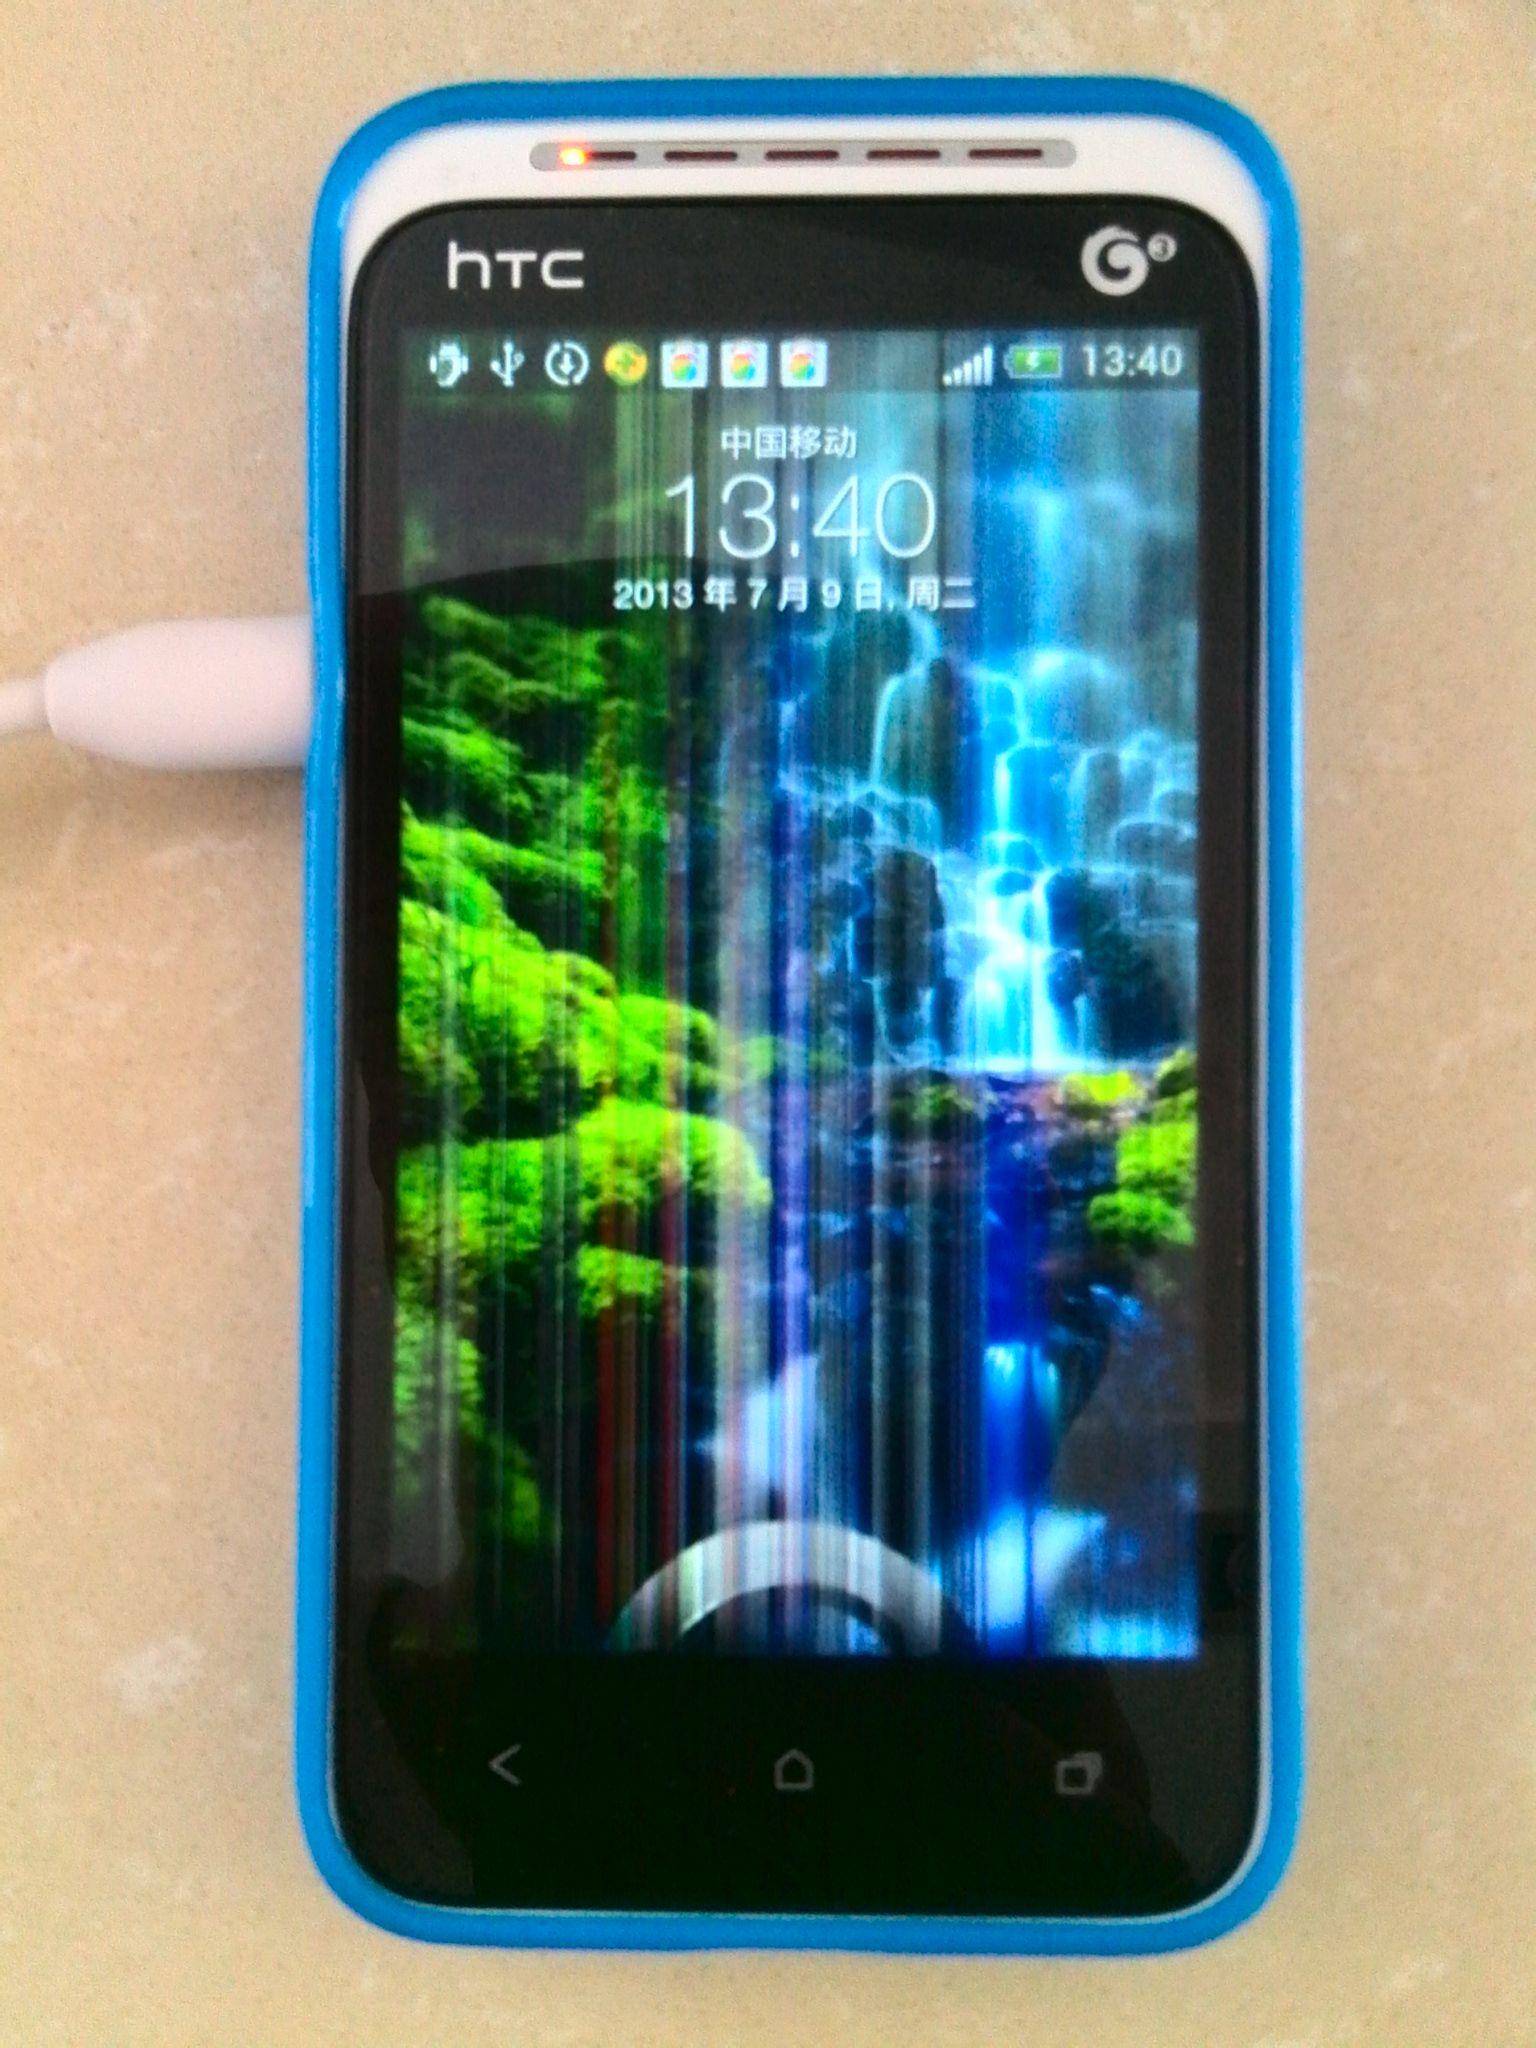 t328trom_htc t328t手机刷机完成后,开机屏幕的红字怎么去除